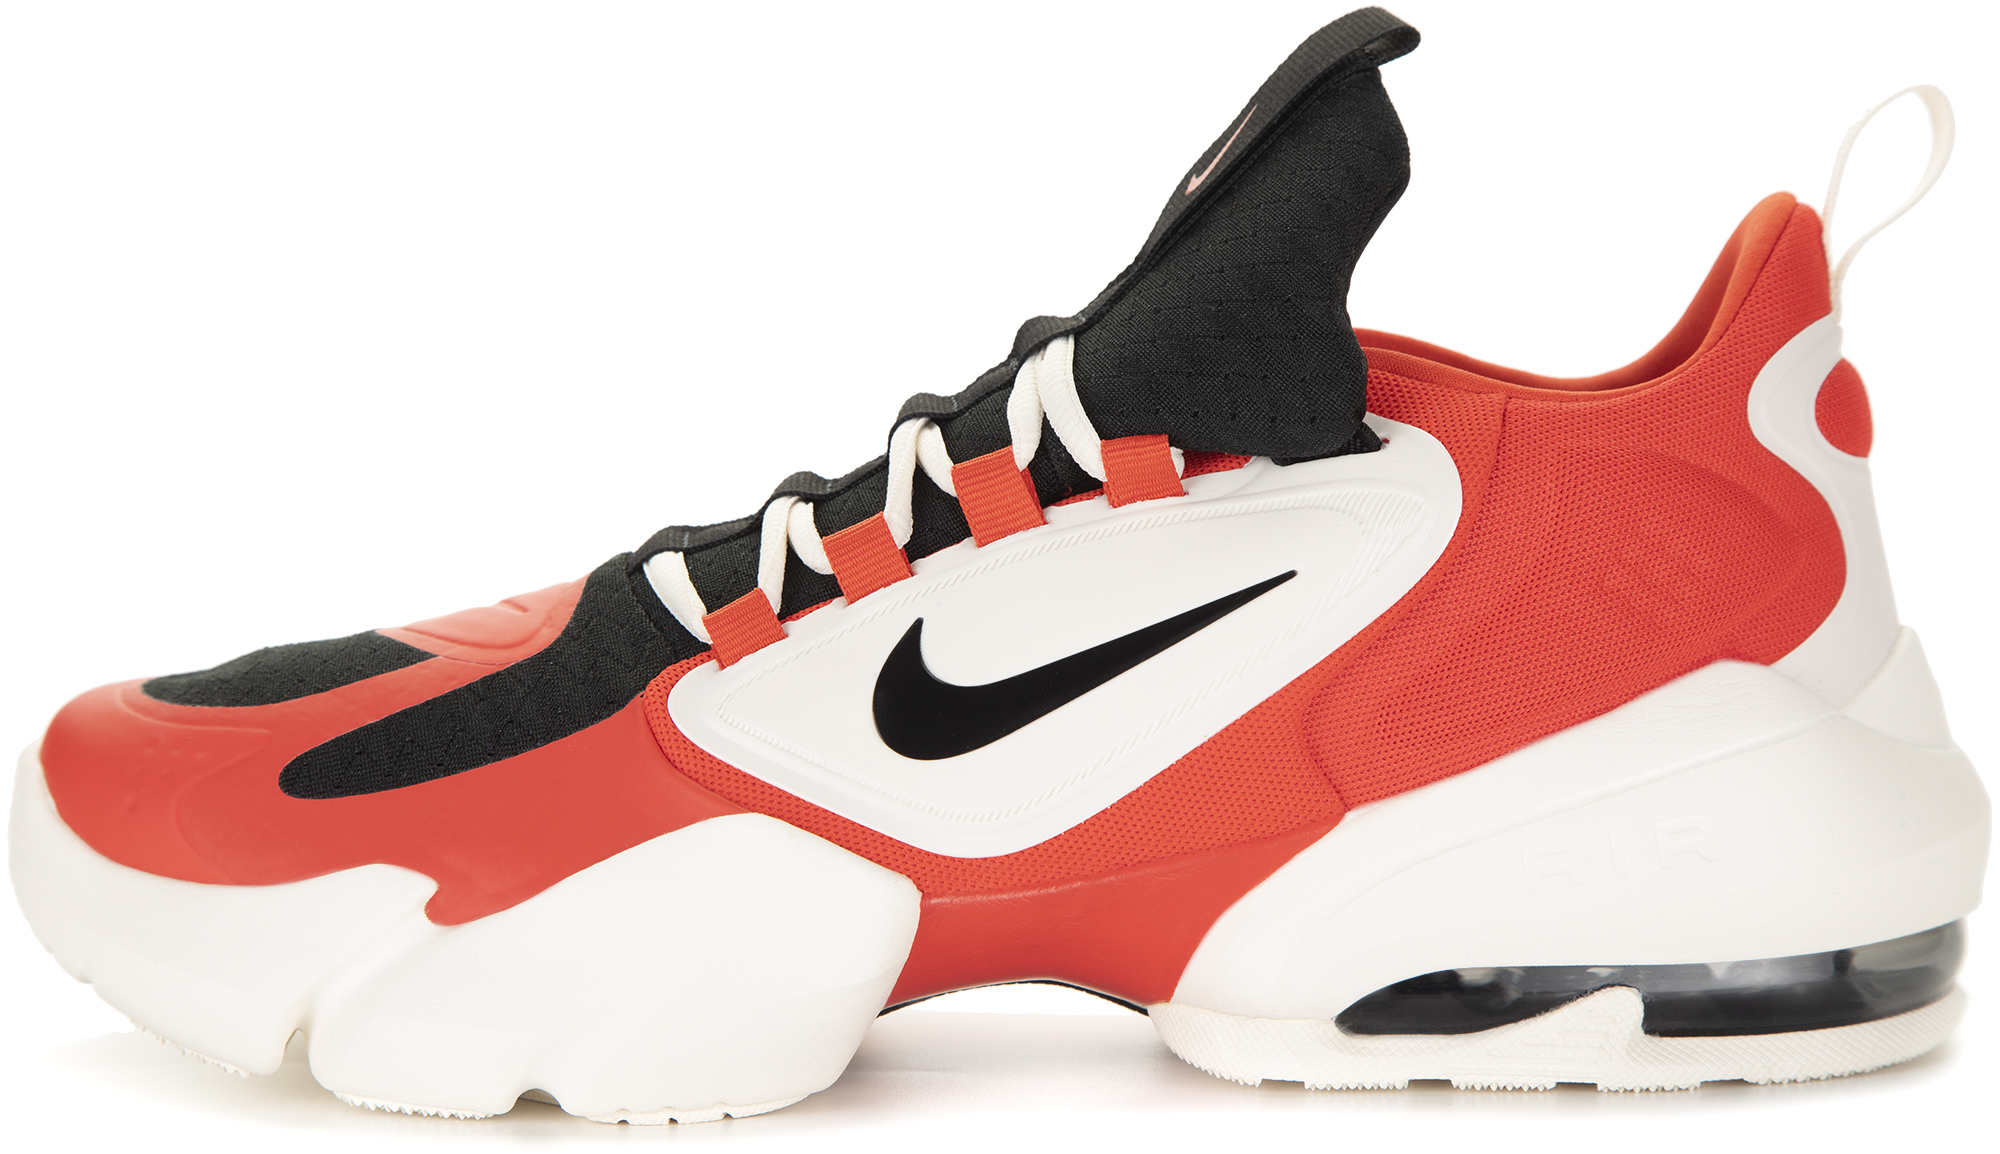 Nike Кроссовки мужские Nike Air Max Alpha Savage, размер 44 цена